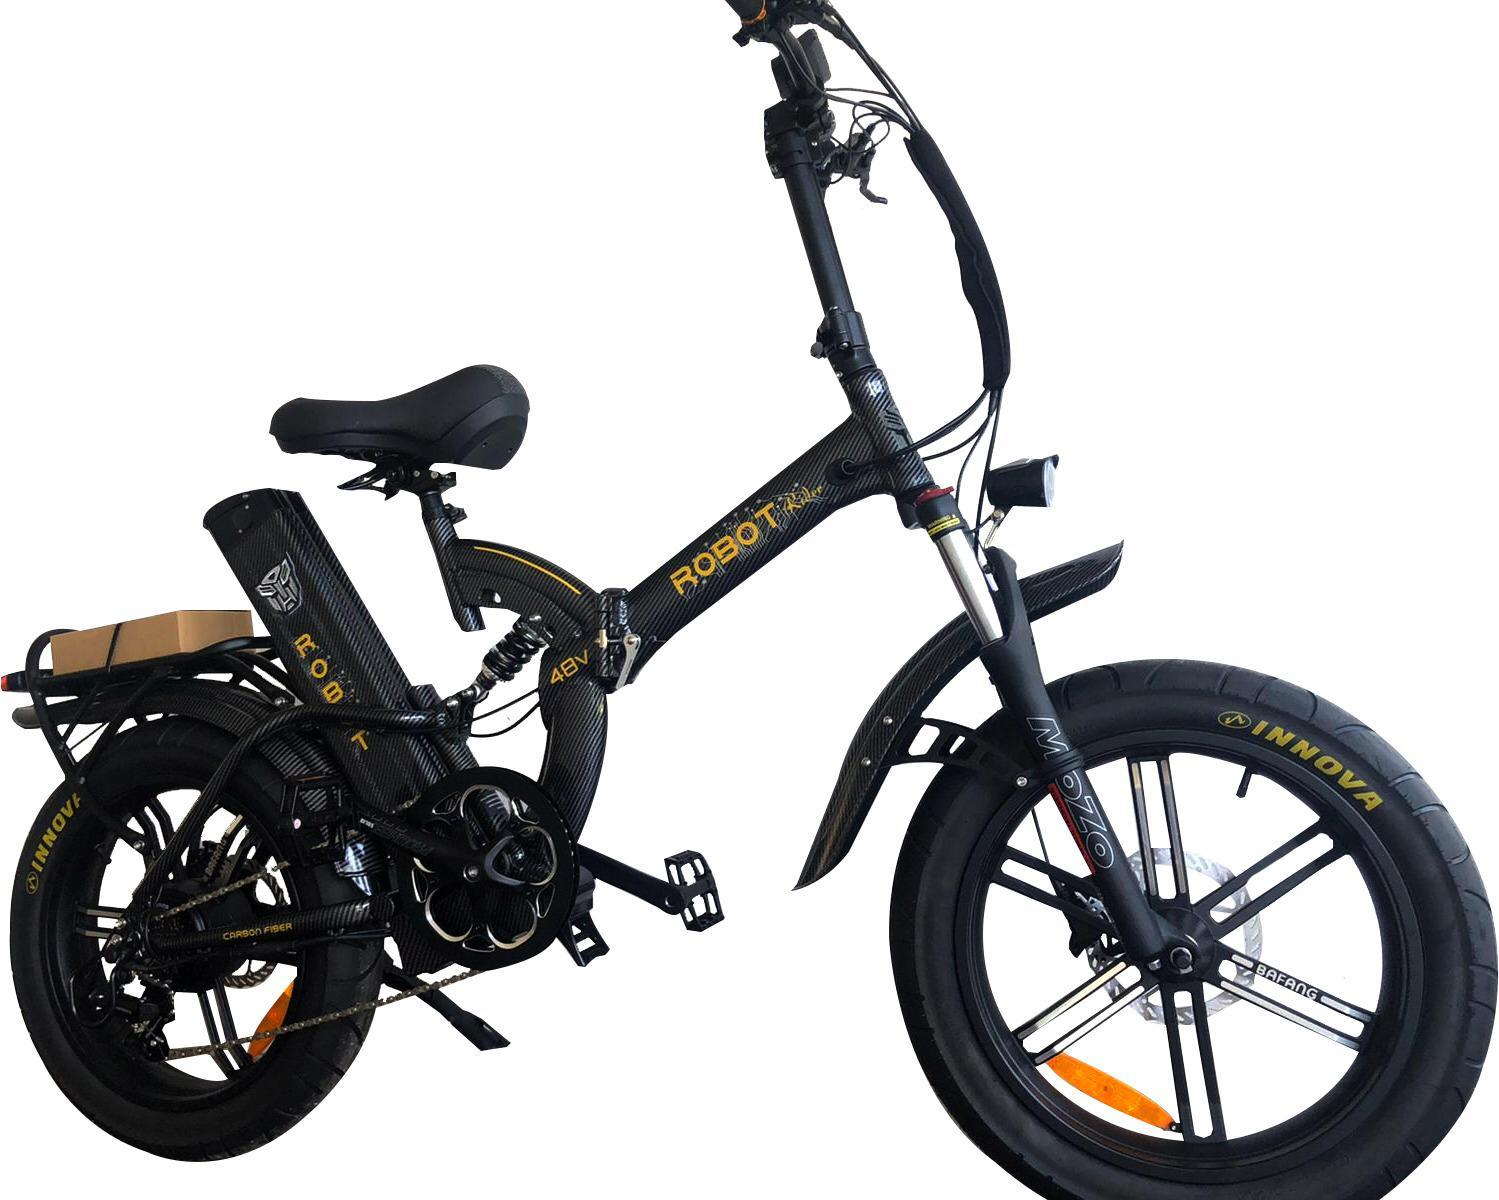 Robot Rider | אופניים חשמליים רובוט ריידר 48V 21A